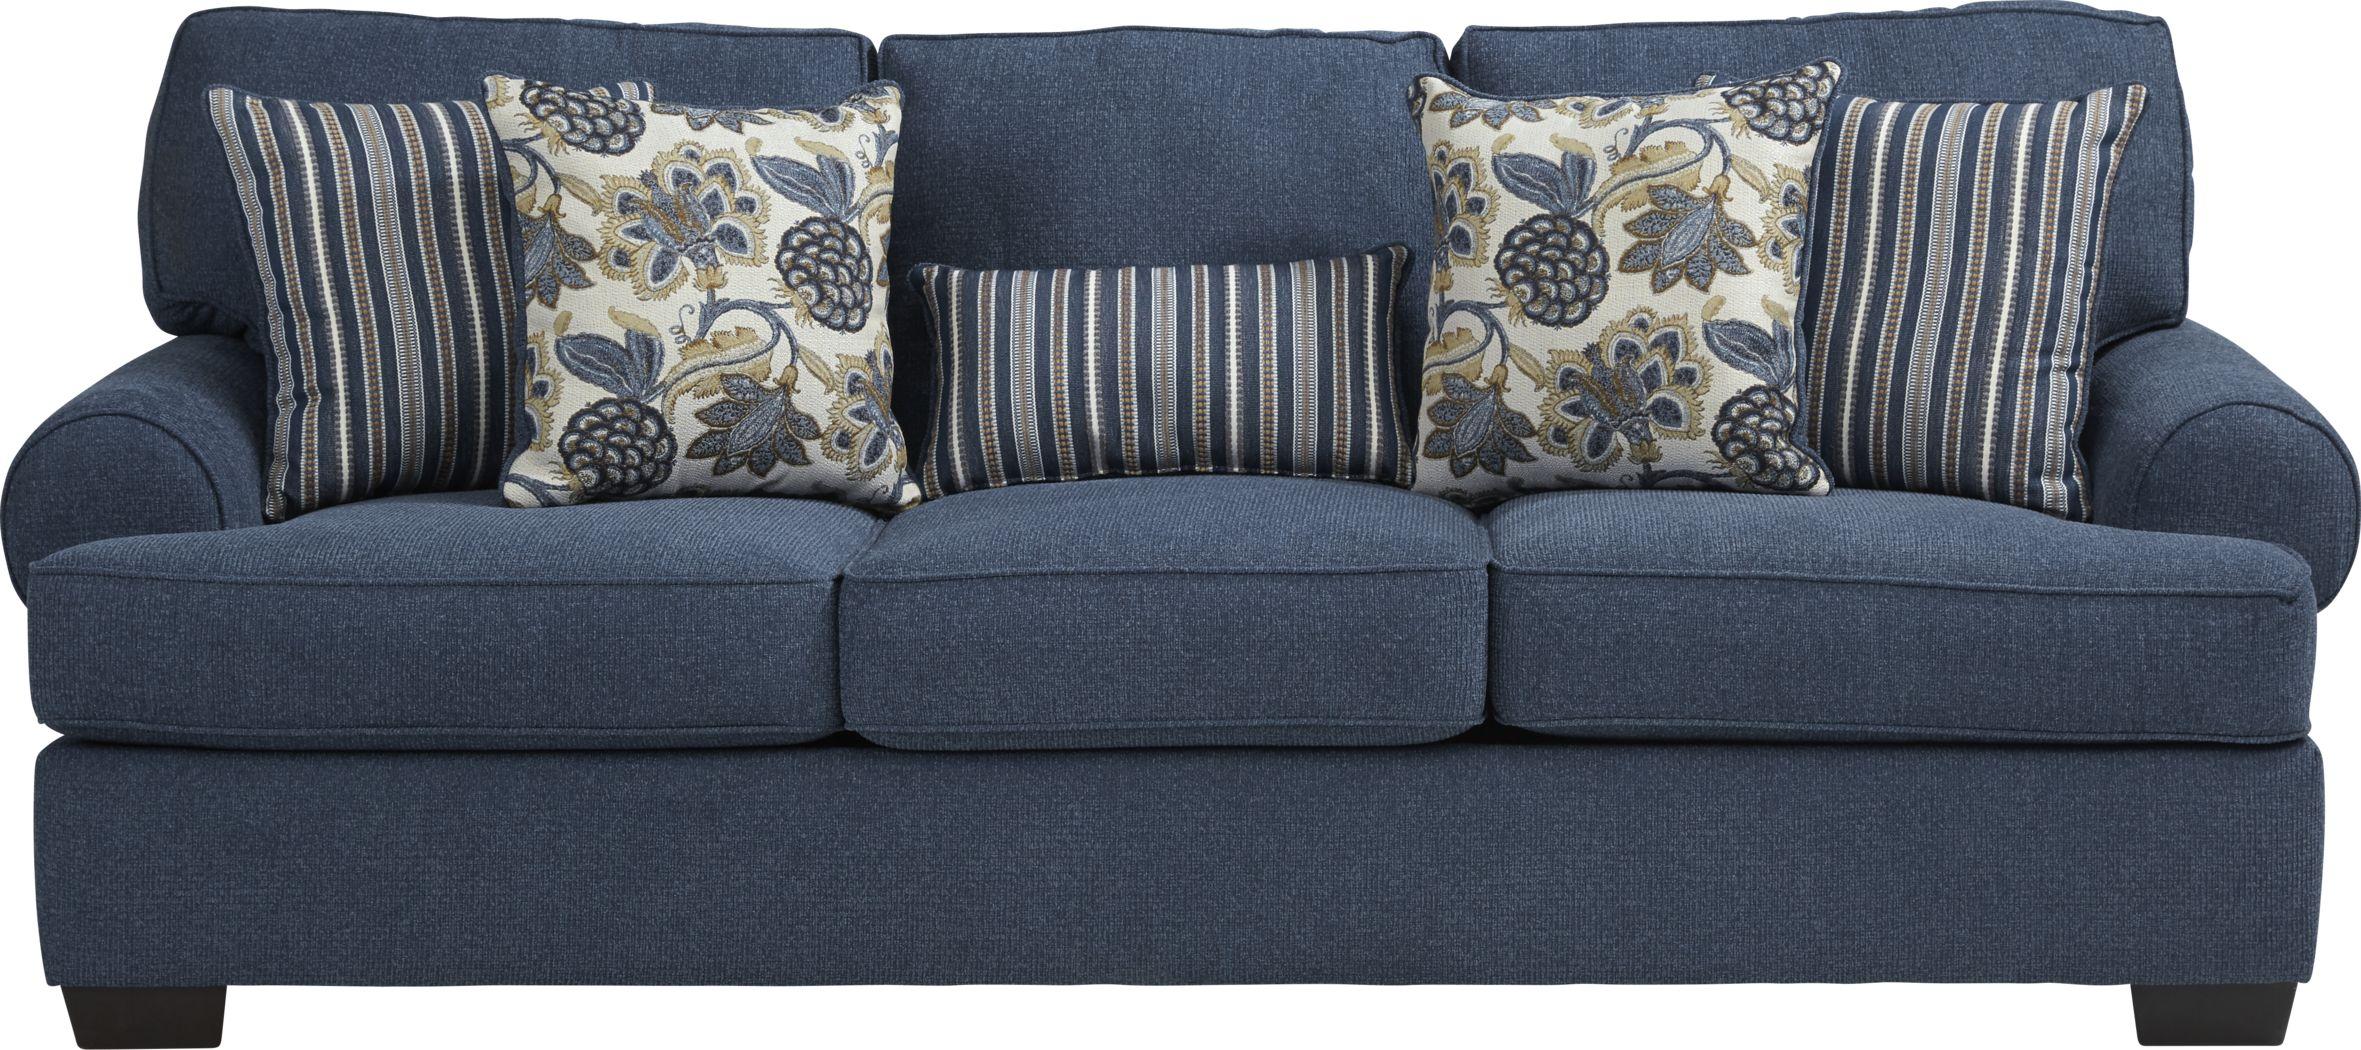 Highland Lakes Blue Sofa